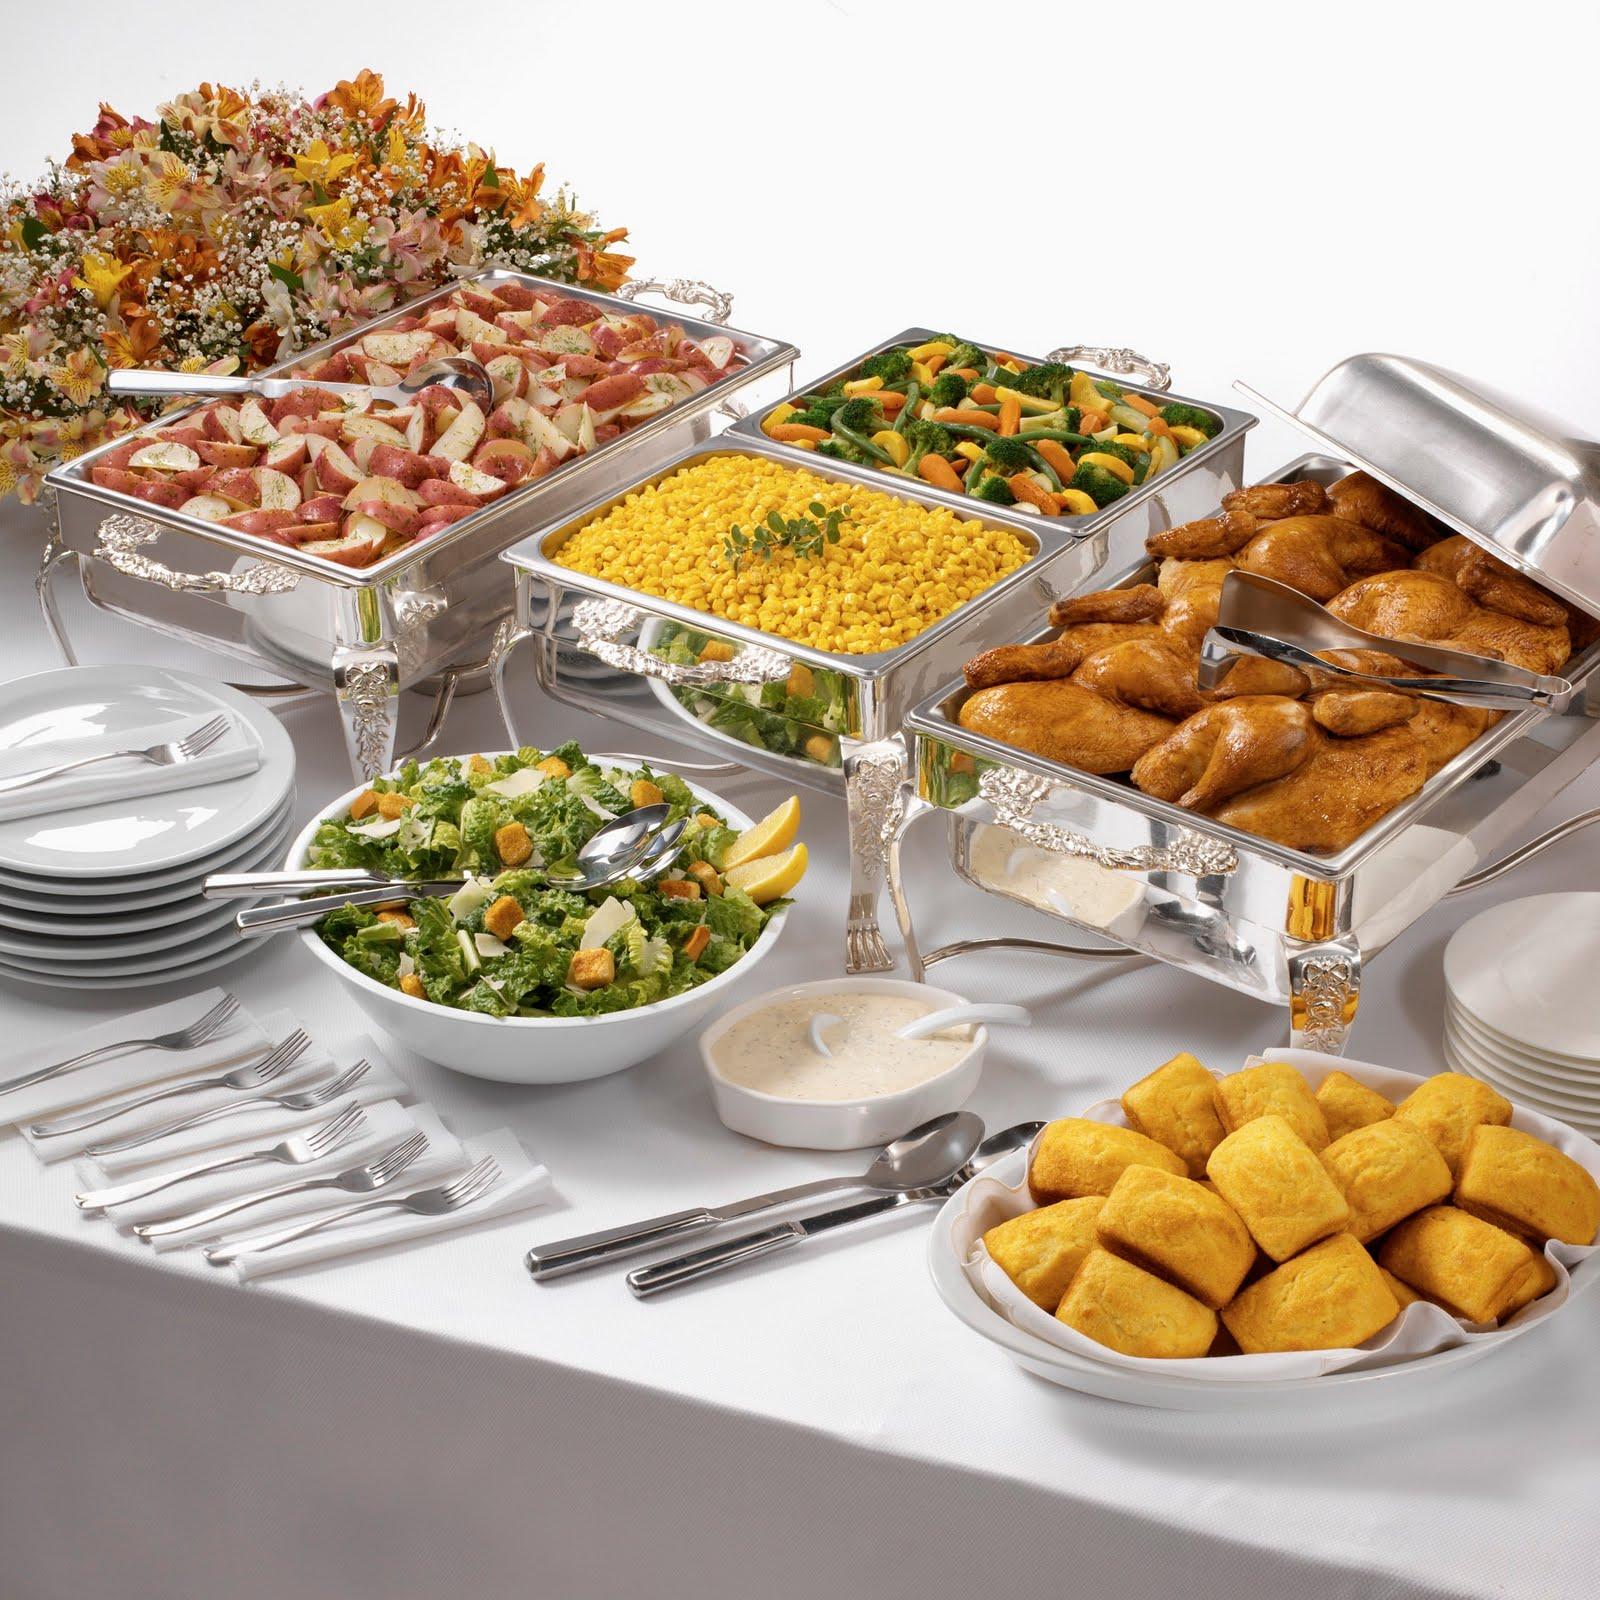 Boston Market Catering Rewards Program